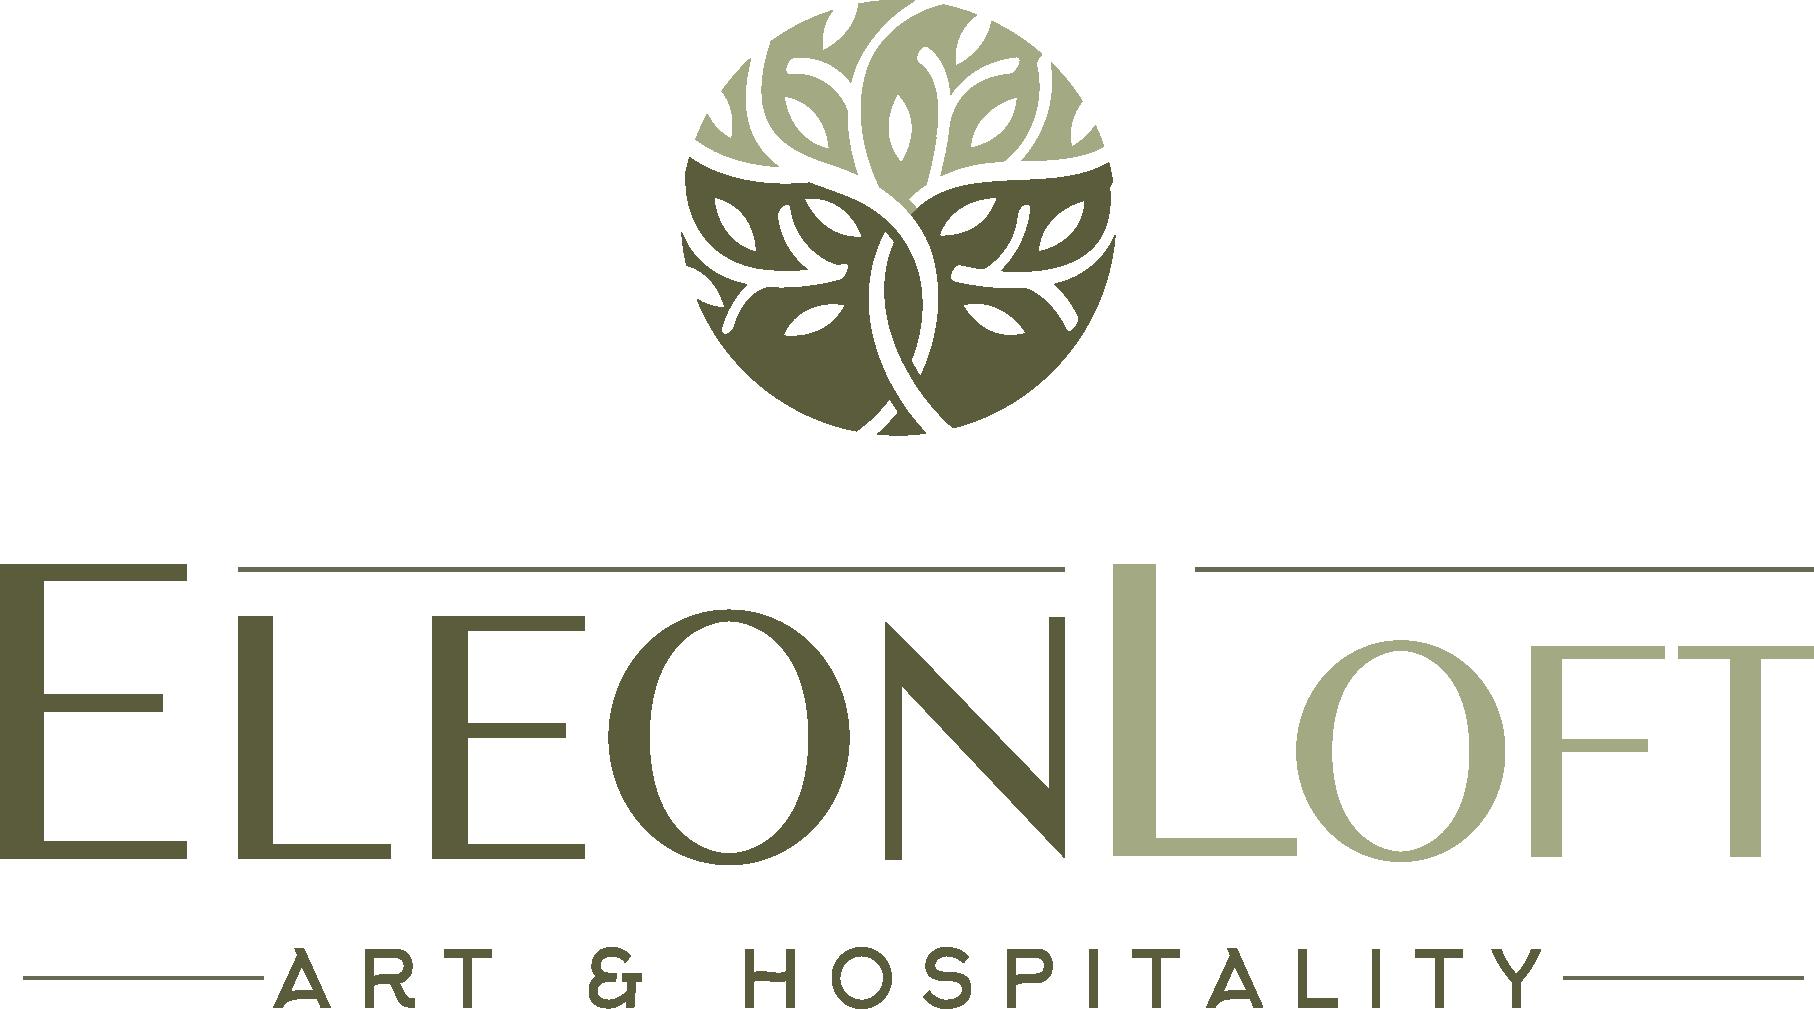 Eleon Loft